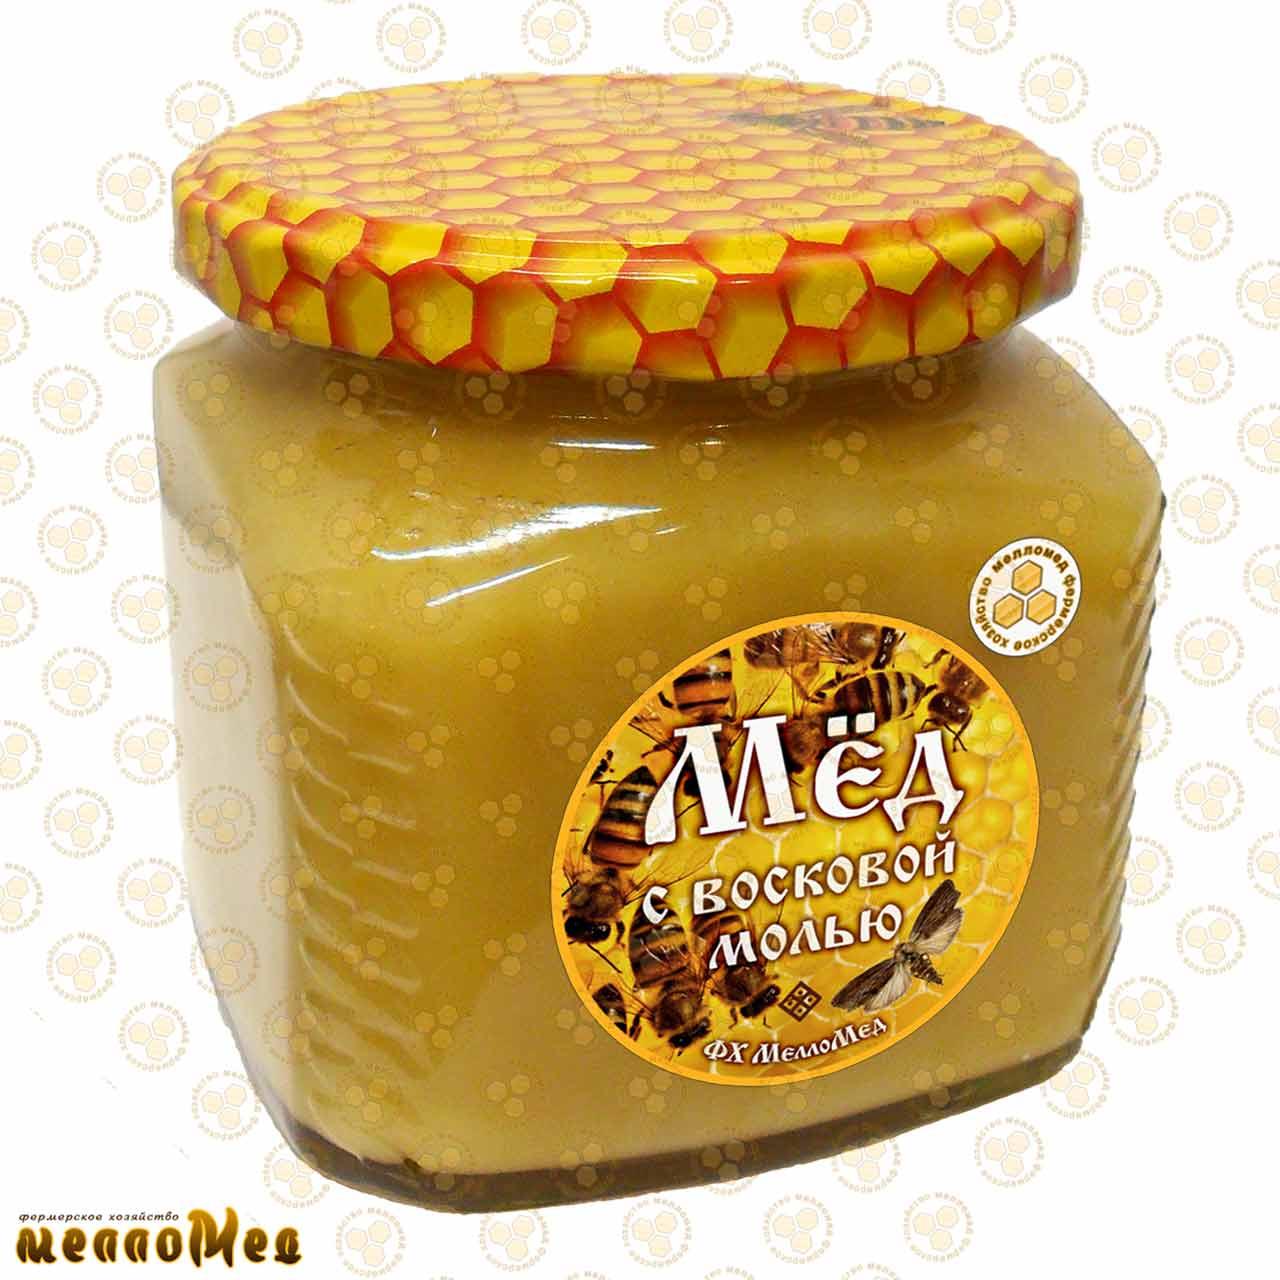 ВОСКОВАЯ МОЛЬ – лечебный мёд 575г